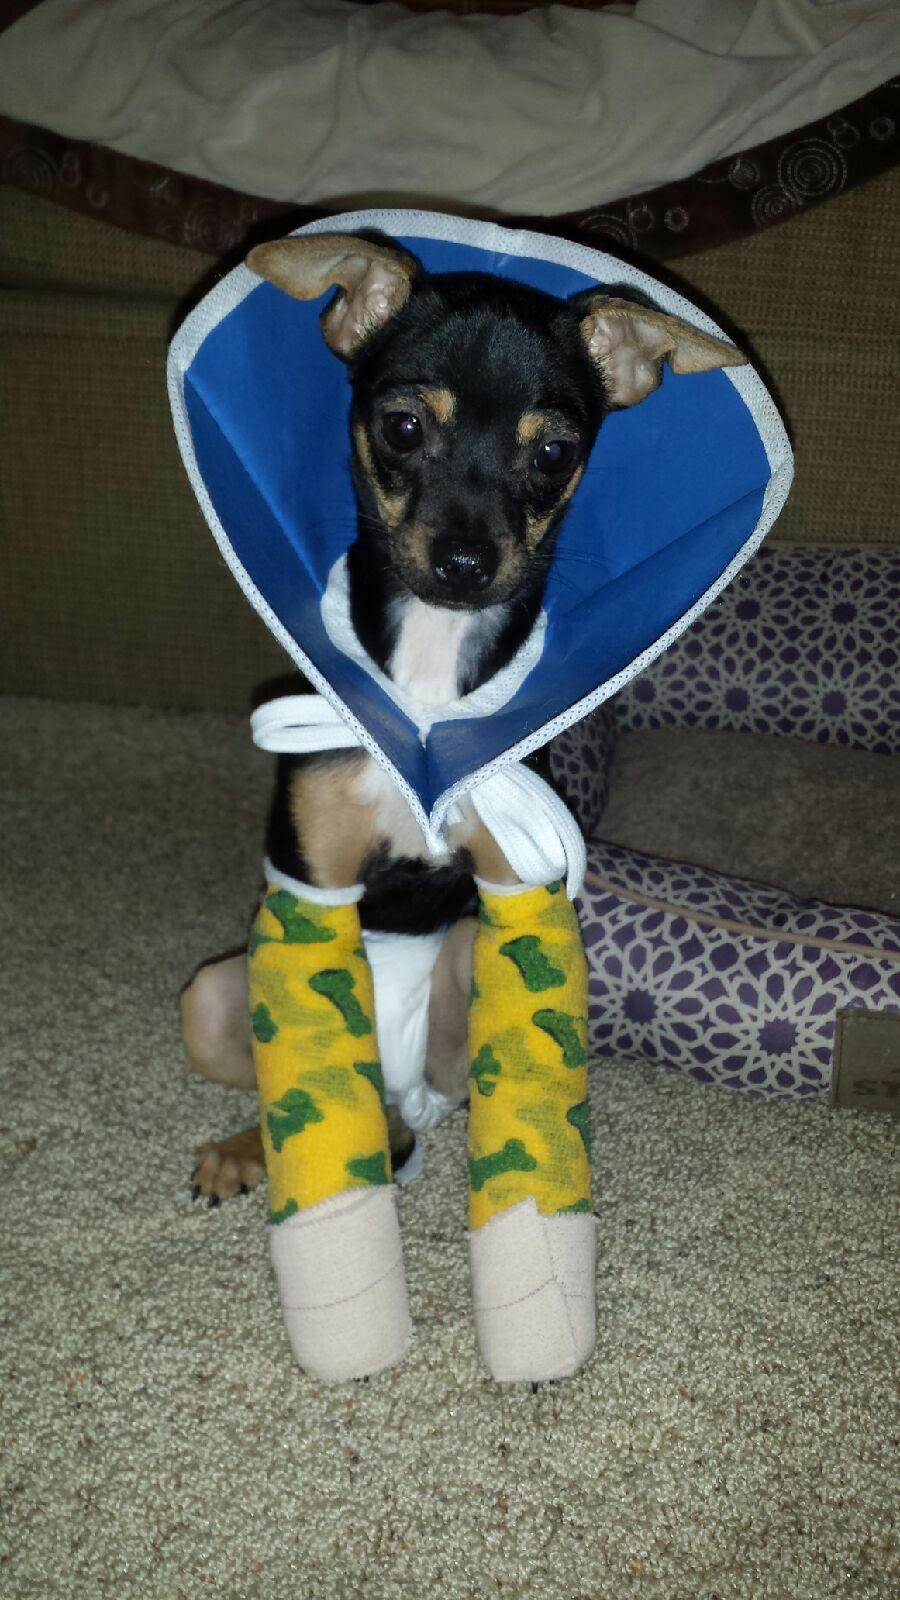 Bearito in his first splint/bandage wrap.